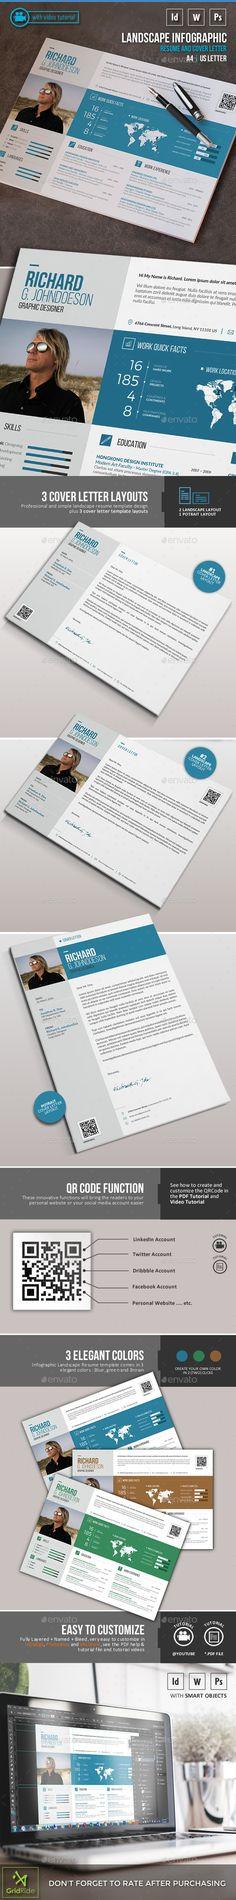 Landscape Infographic Resume - Resumes Stationery Infographic Resume Template, Best Resume Template, Resume Design Template, Cv Template, Cv Design, Web Design Tips, Graphic Design, Cover Letter Layout, Cv Curriculum Vitae